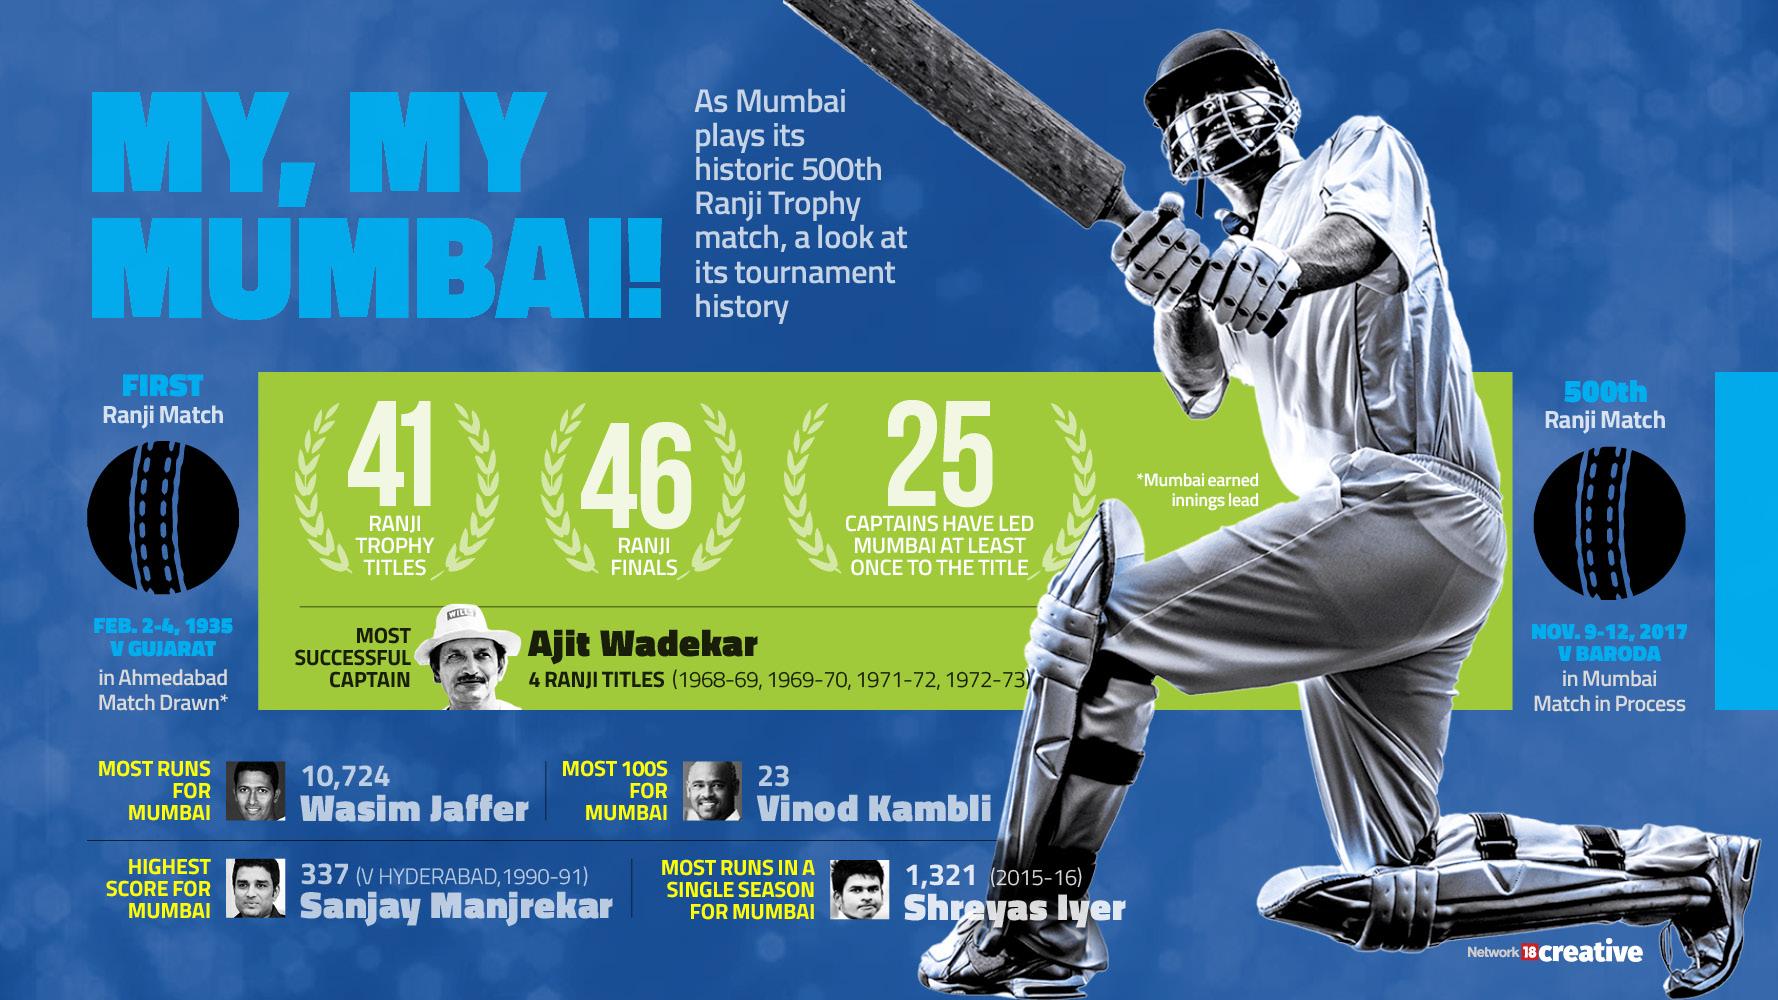 A look at the Mumbai Ranji Trophy Team statistics :